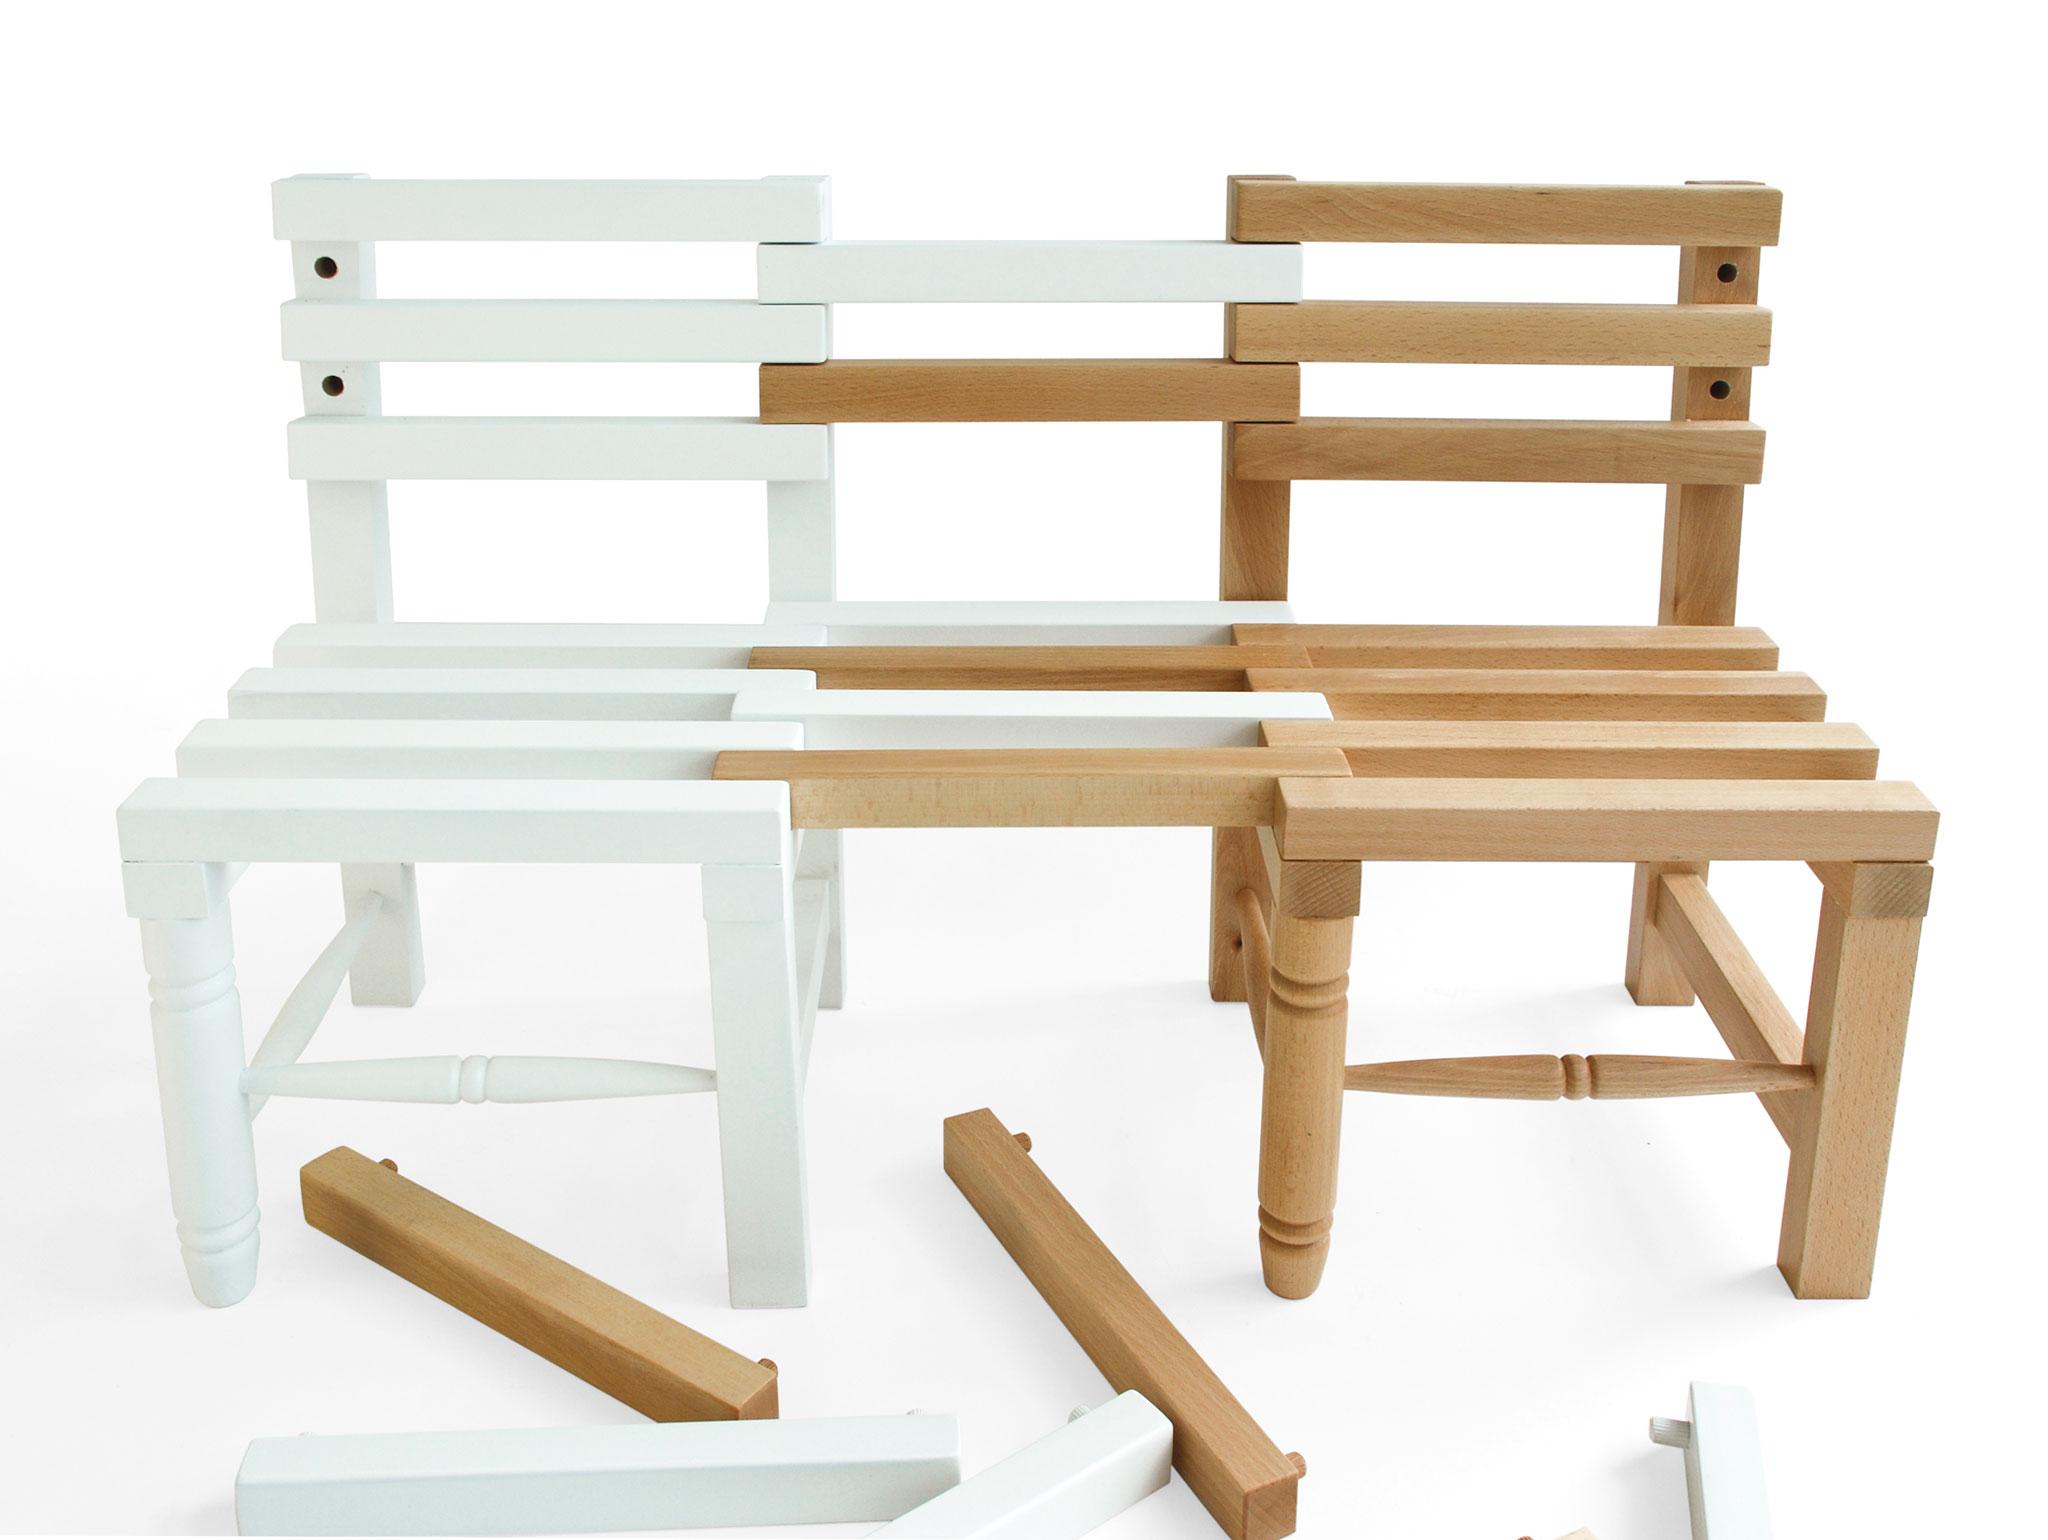 diseno_producto_mobiliario_silla_infantil_madera_lacada_blanco_natural